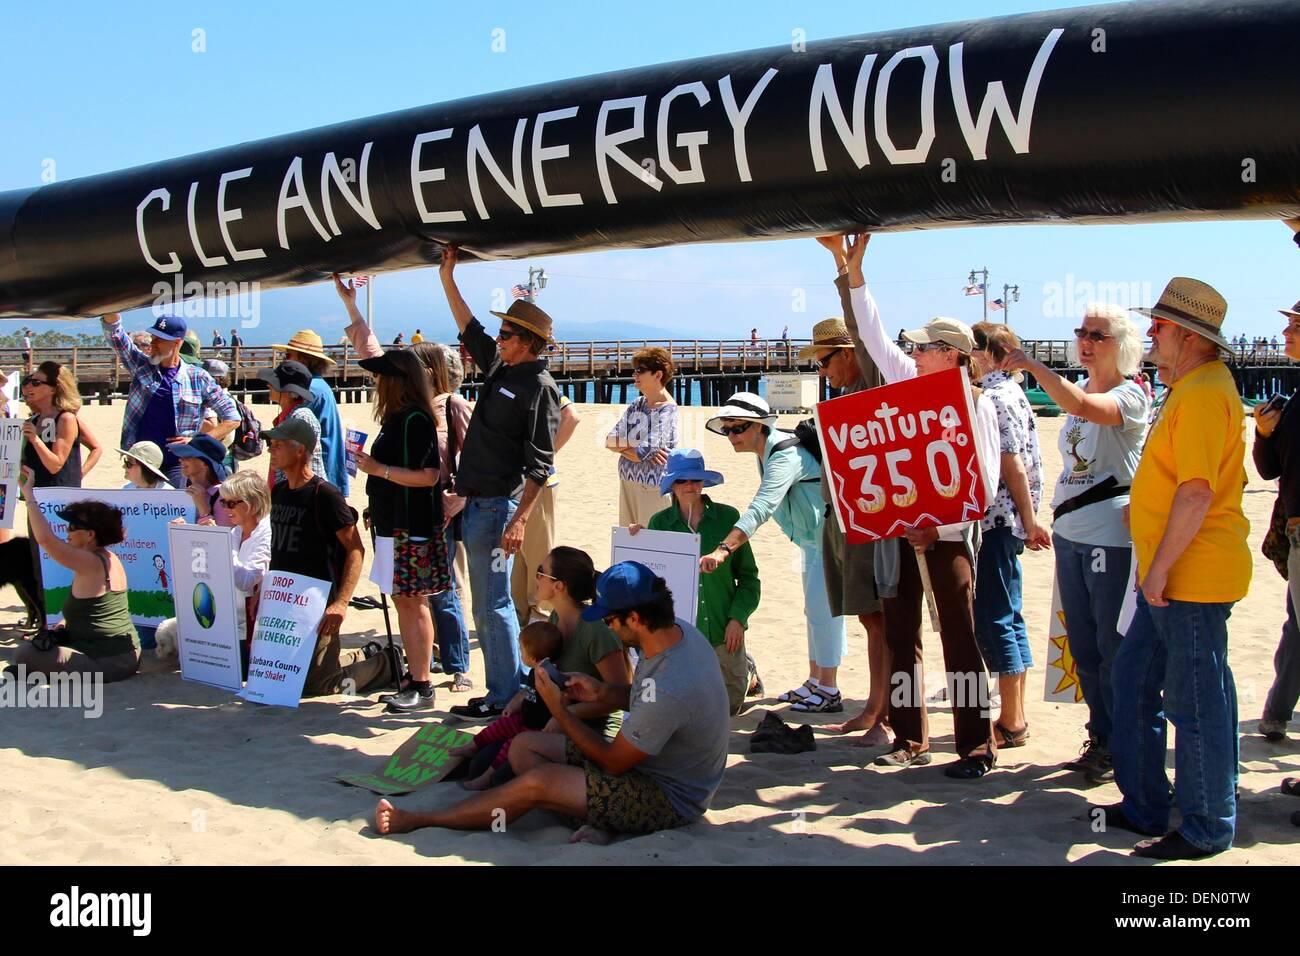 Energia pulita ora, Keystone Pipeline protesta a Santa Barbara, California USA Immagini Stock